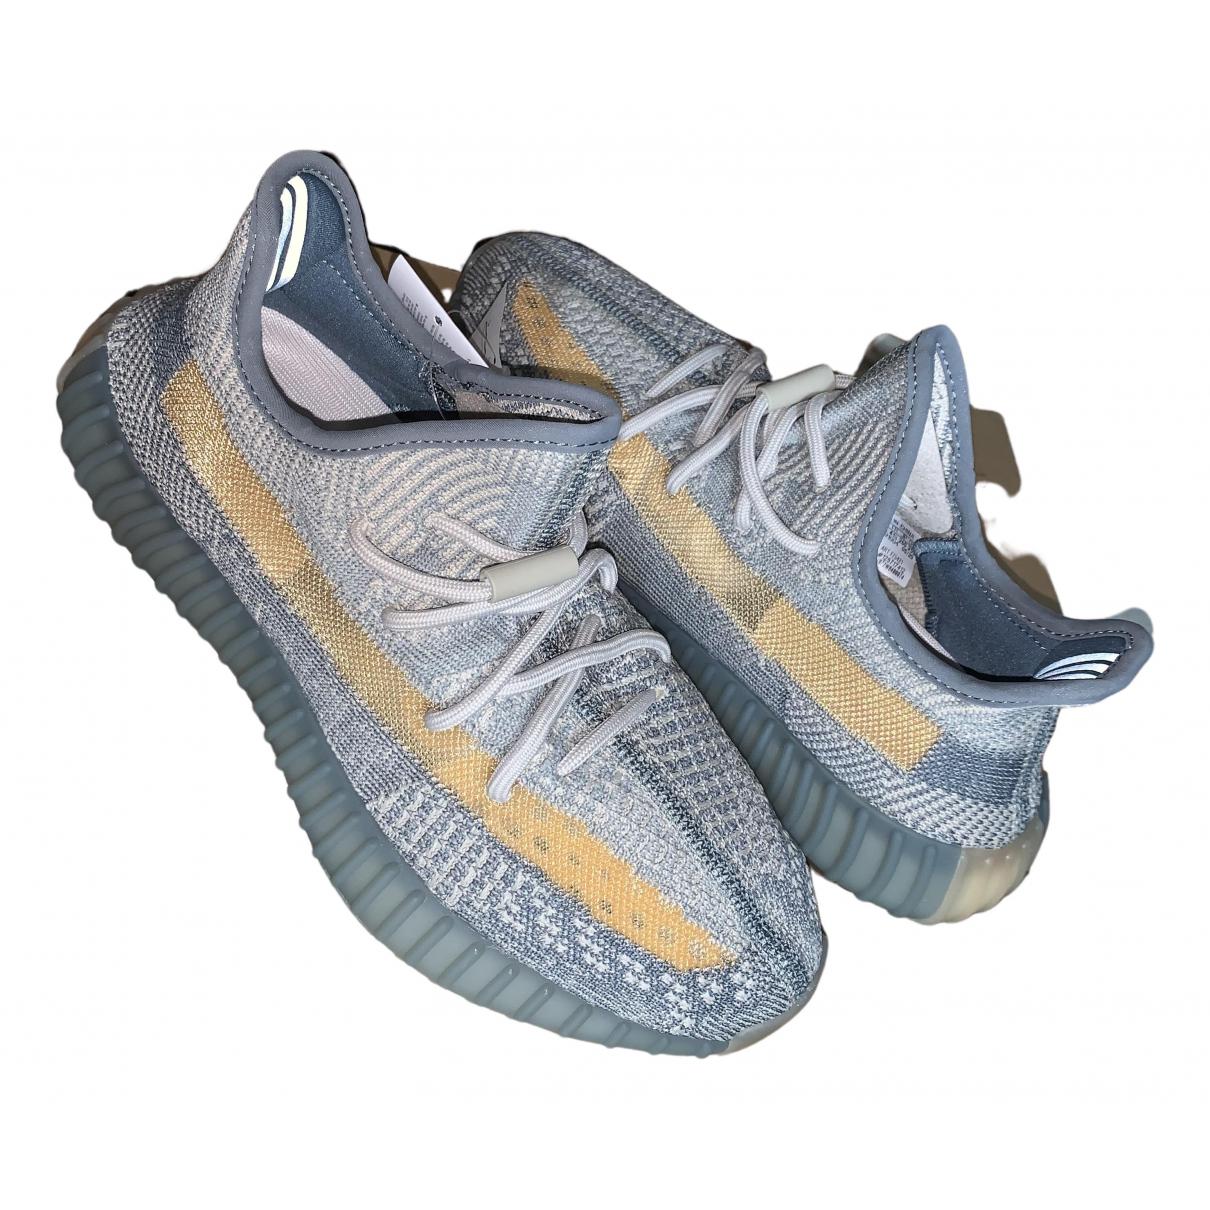 Yeezy X Adidas - Baskets Boost 350 V2 pour homme - bleu